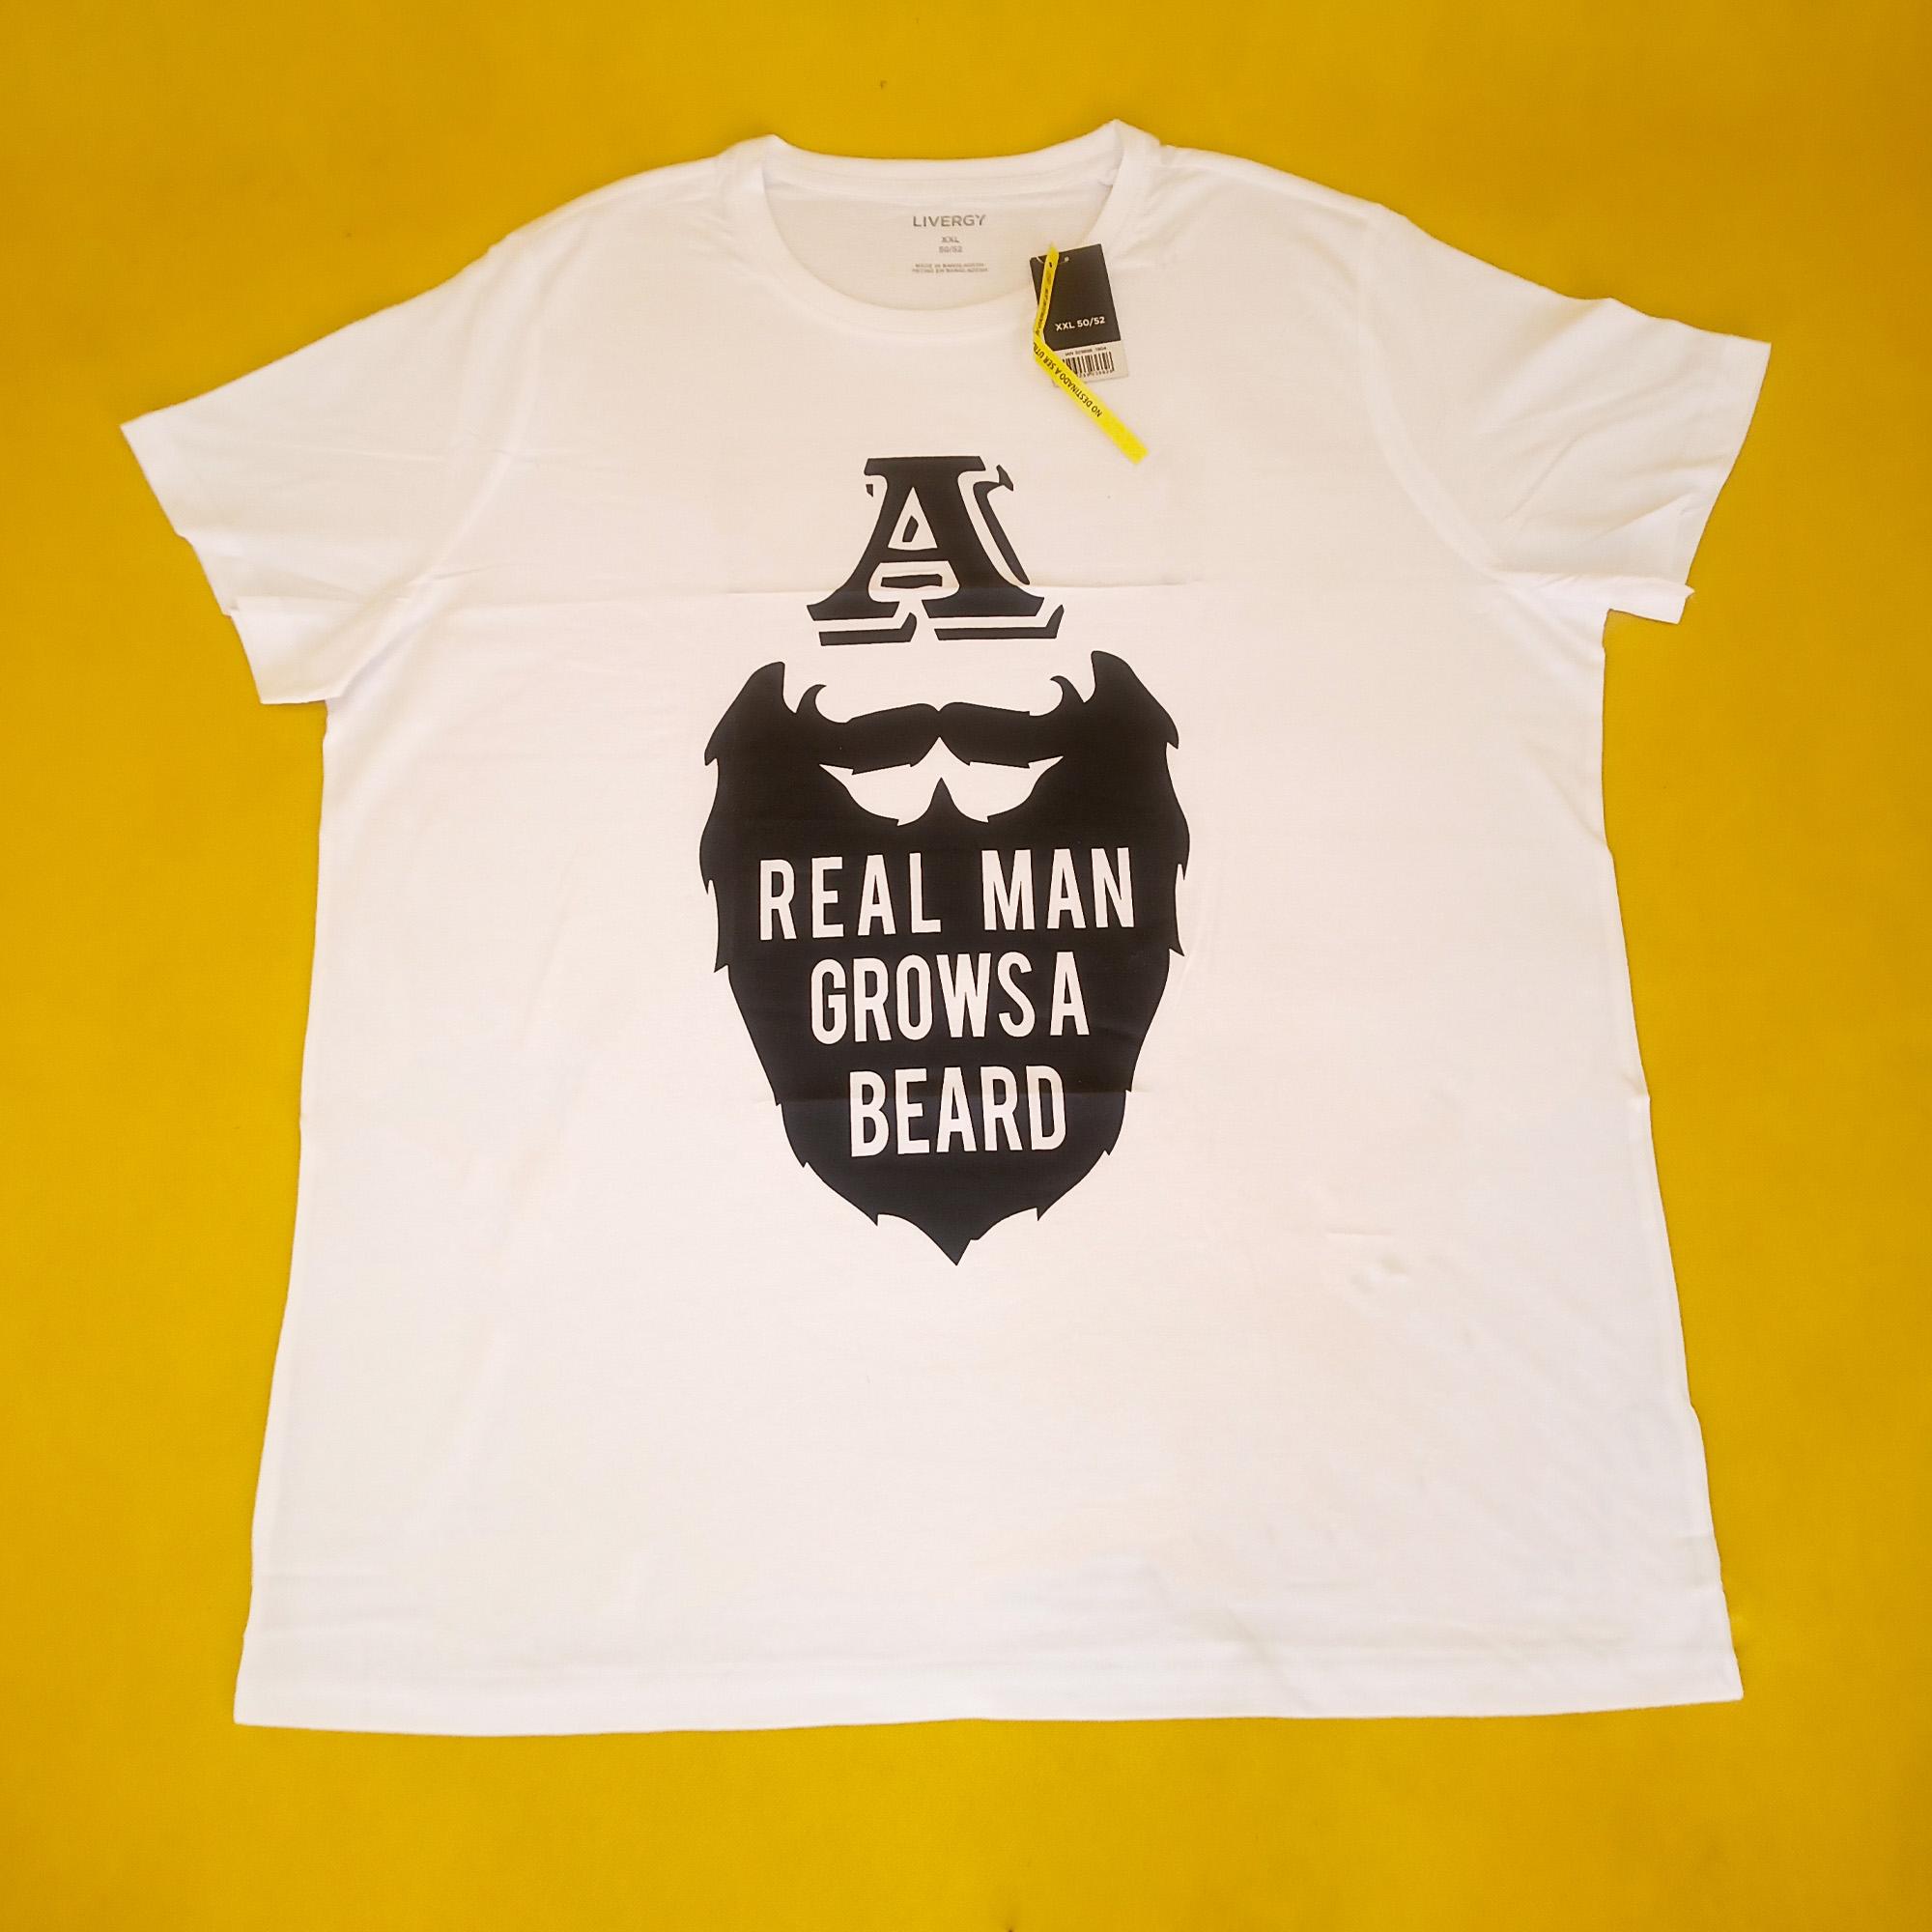 تیشرت نخی مردانه لیورجی چاپ دار کد 40 سفید